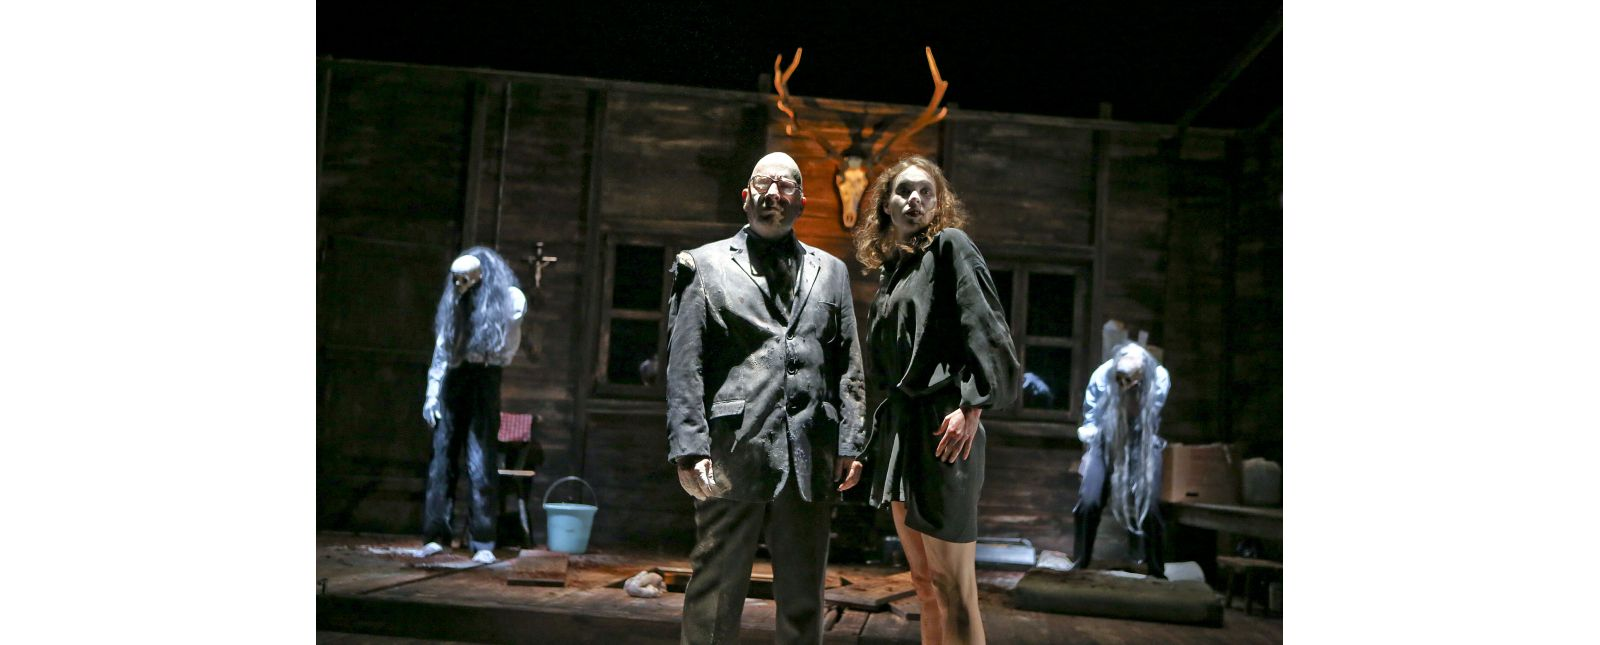 The Black Forest Chainsaw Opera // Lukas Hupfeld, Holger Kunkel, Inga Schäfer, Janna Horstmann // Birgit Hupfeld / 2018